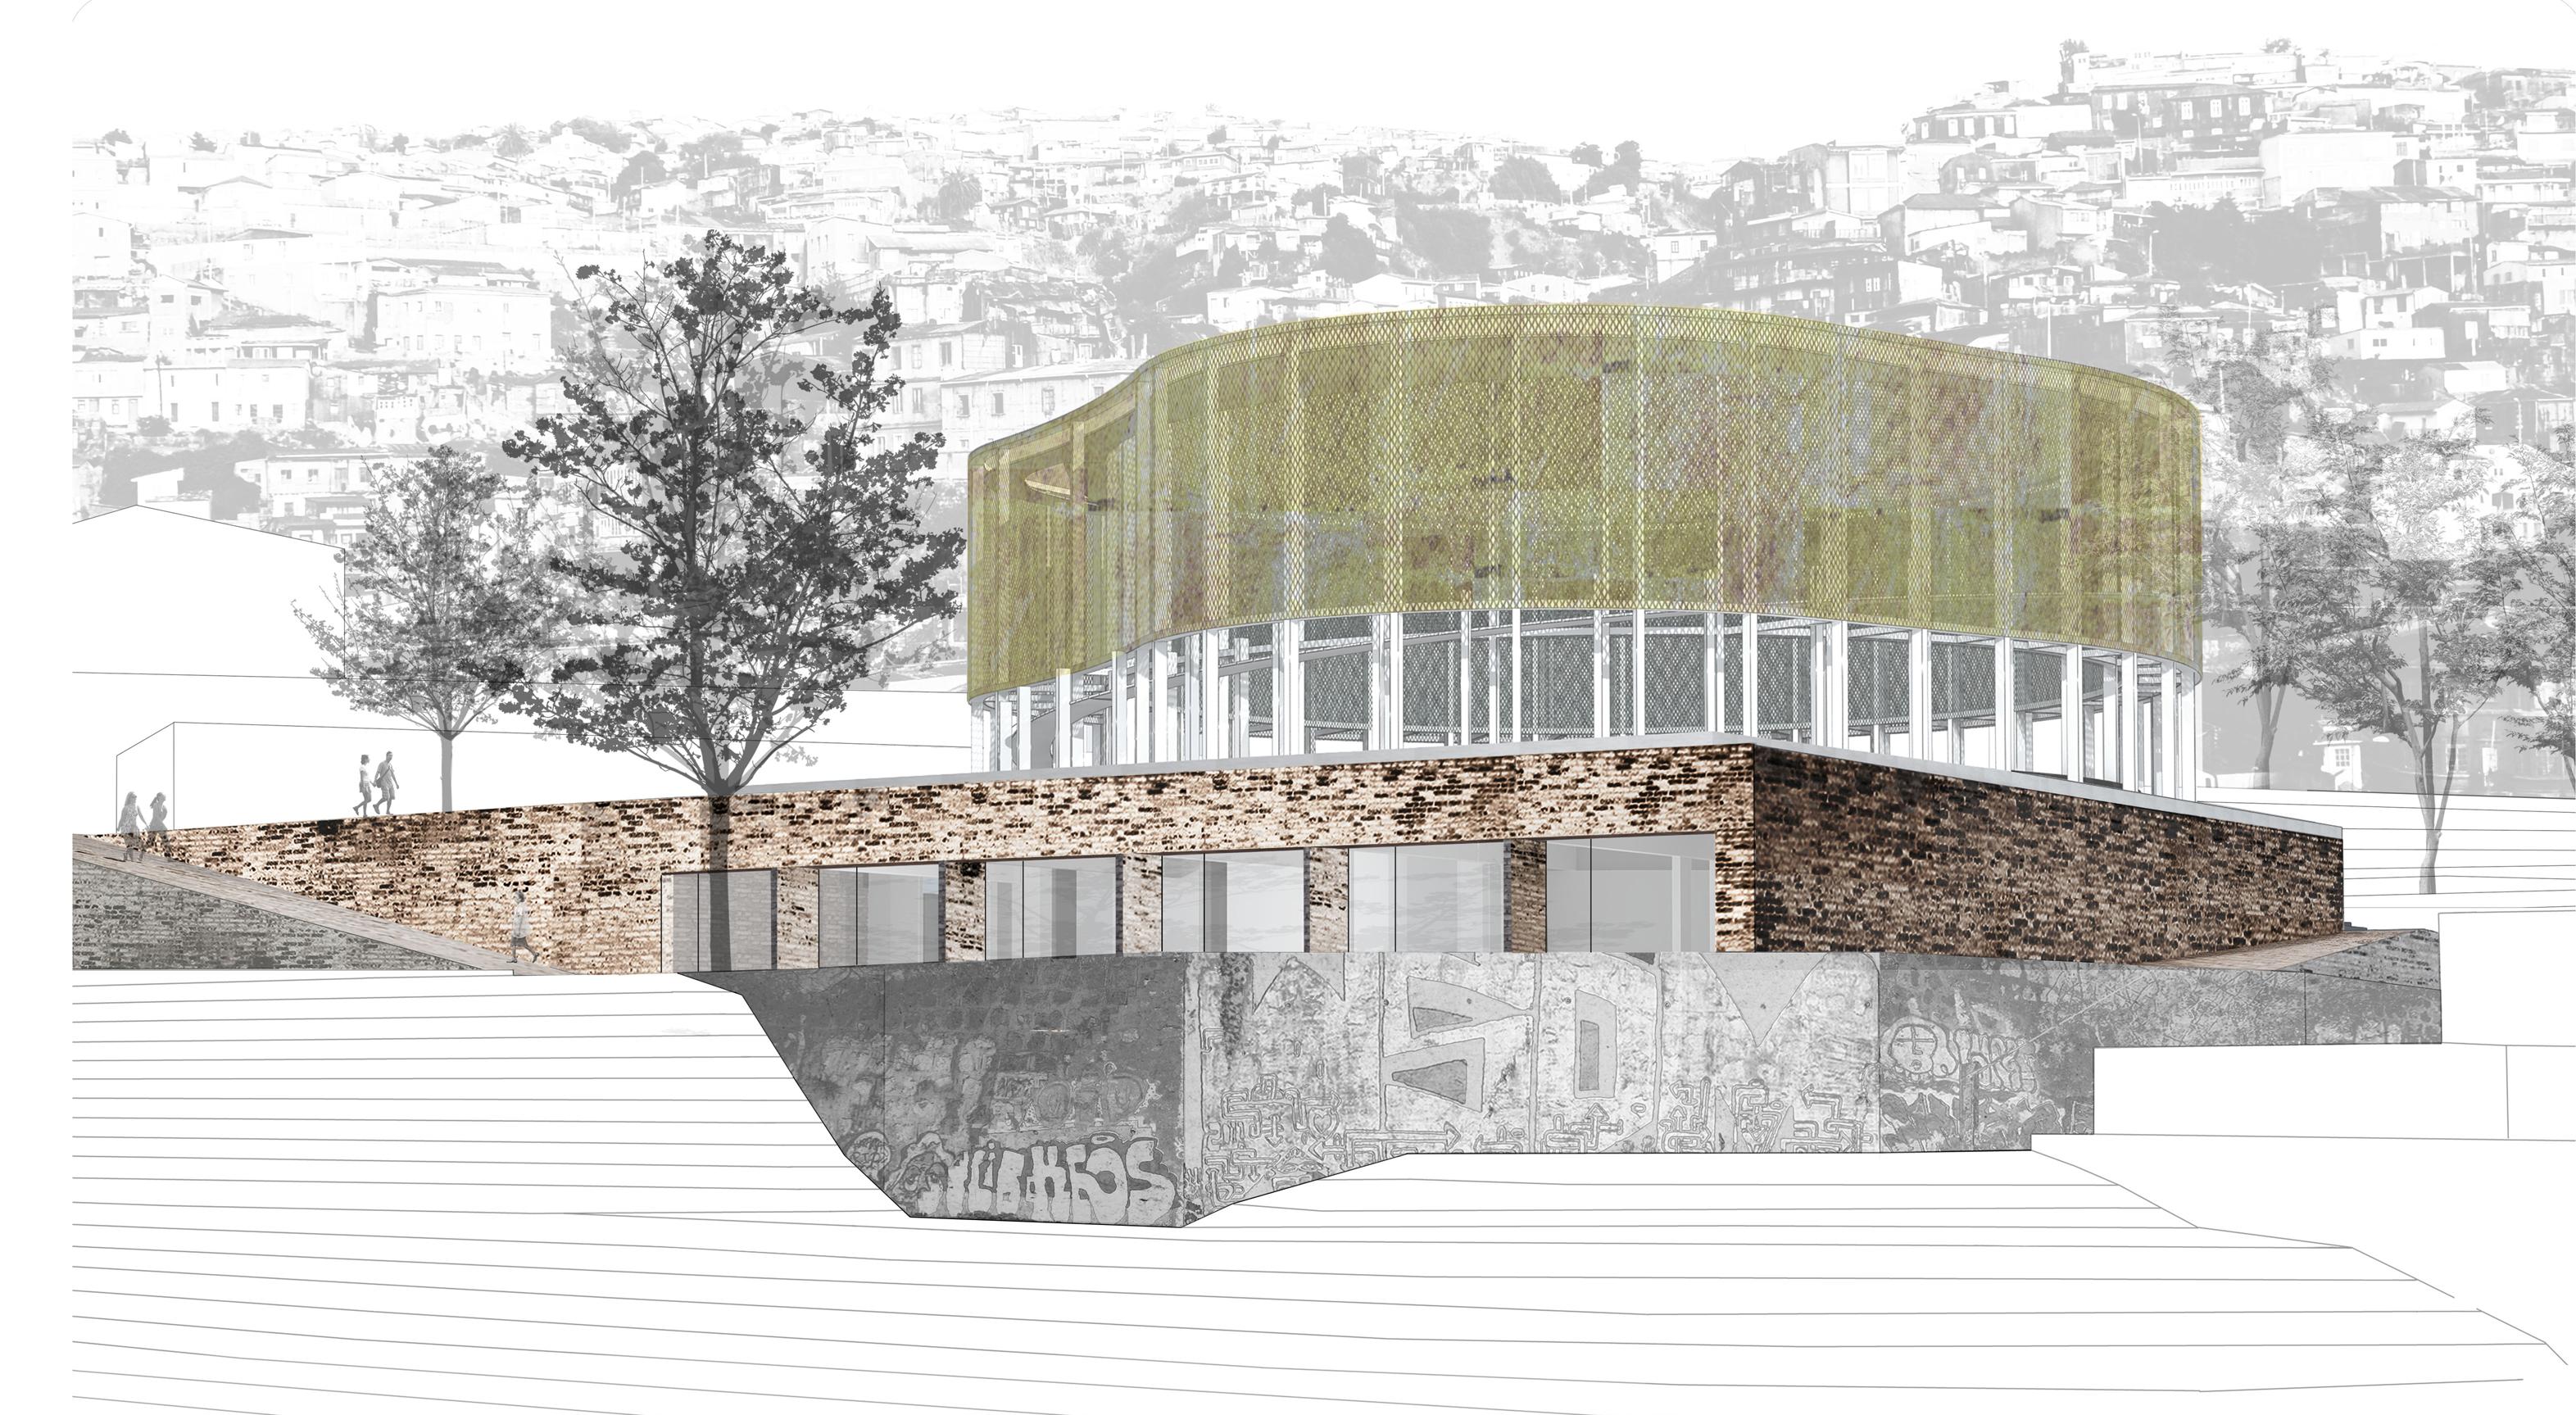 Resultados concurso nacional de anteproyectos for Sitios web de arquitectura